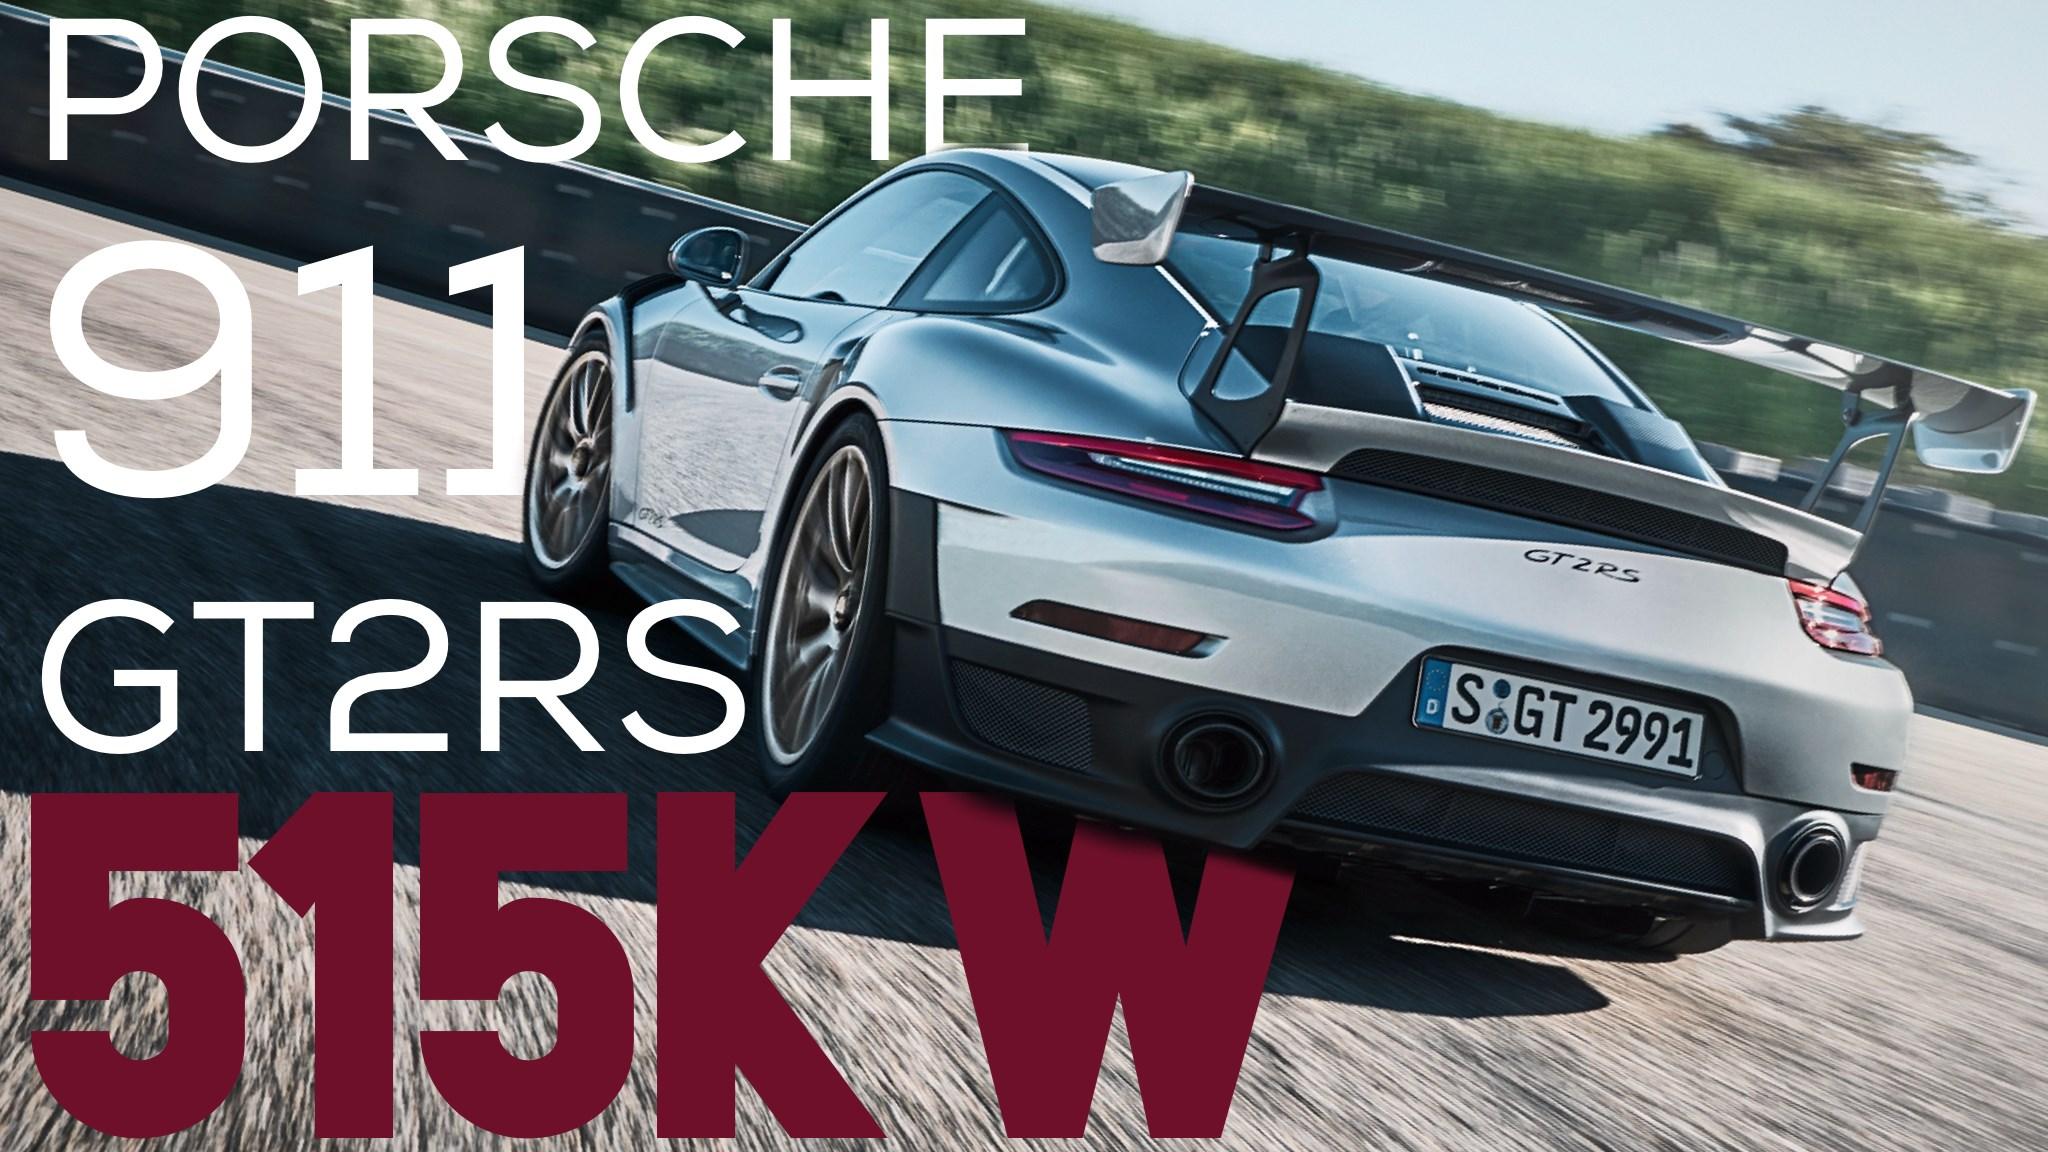 Porsche 911 GT2 RS Gets Full Reveal At Goodwood